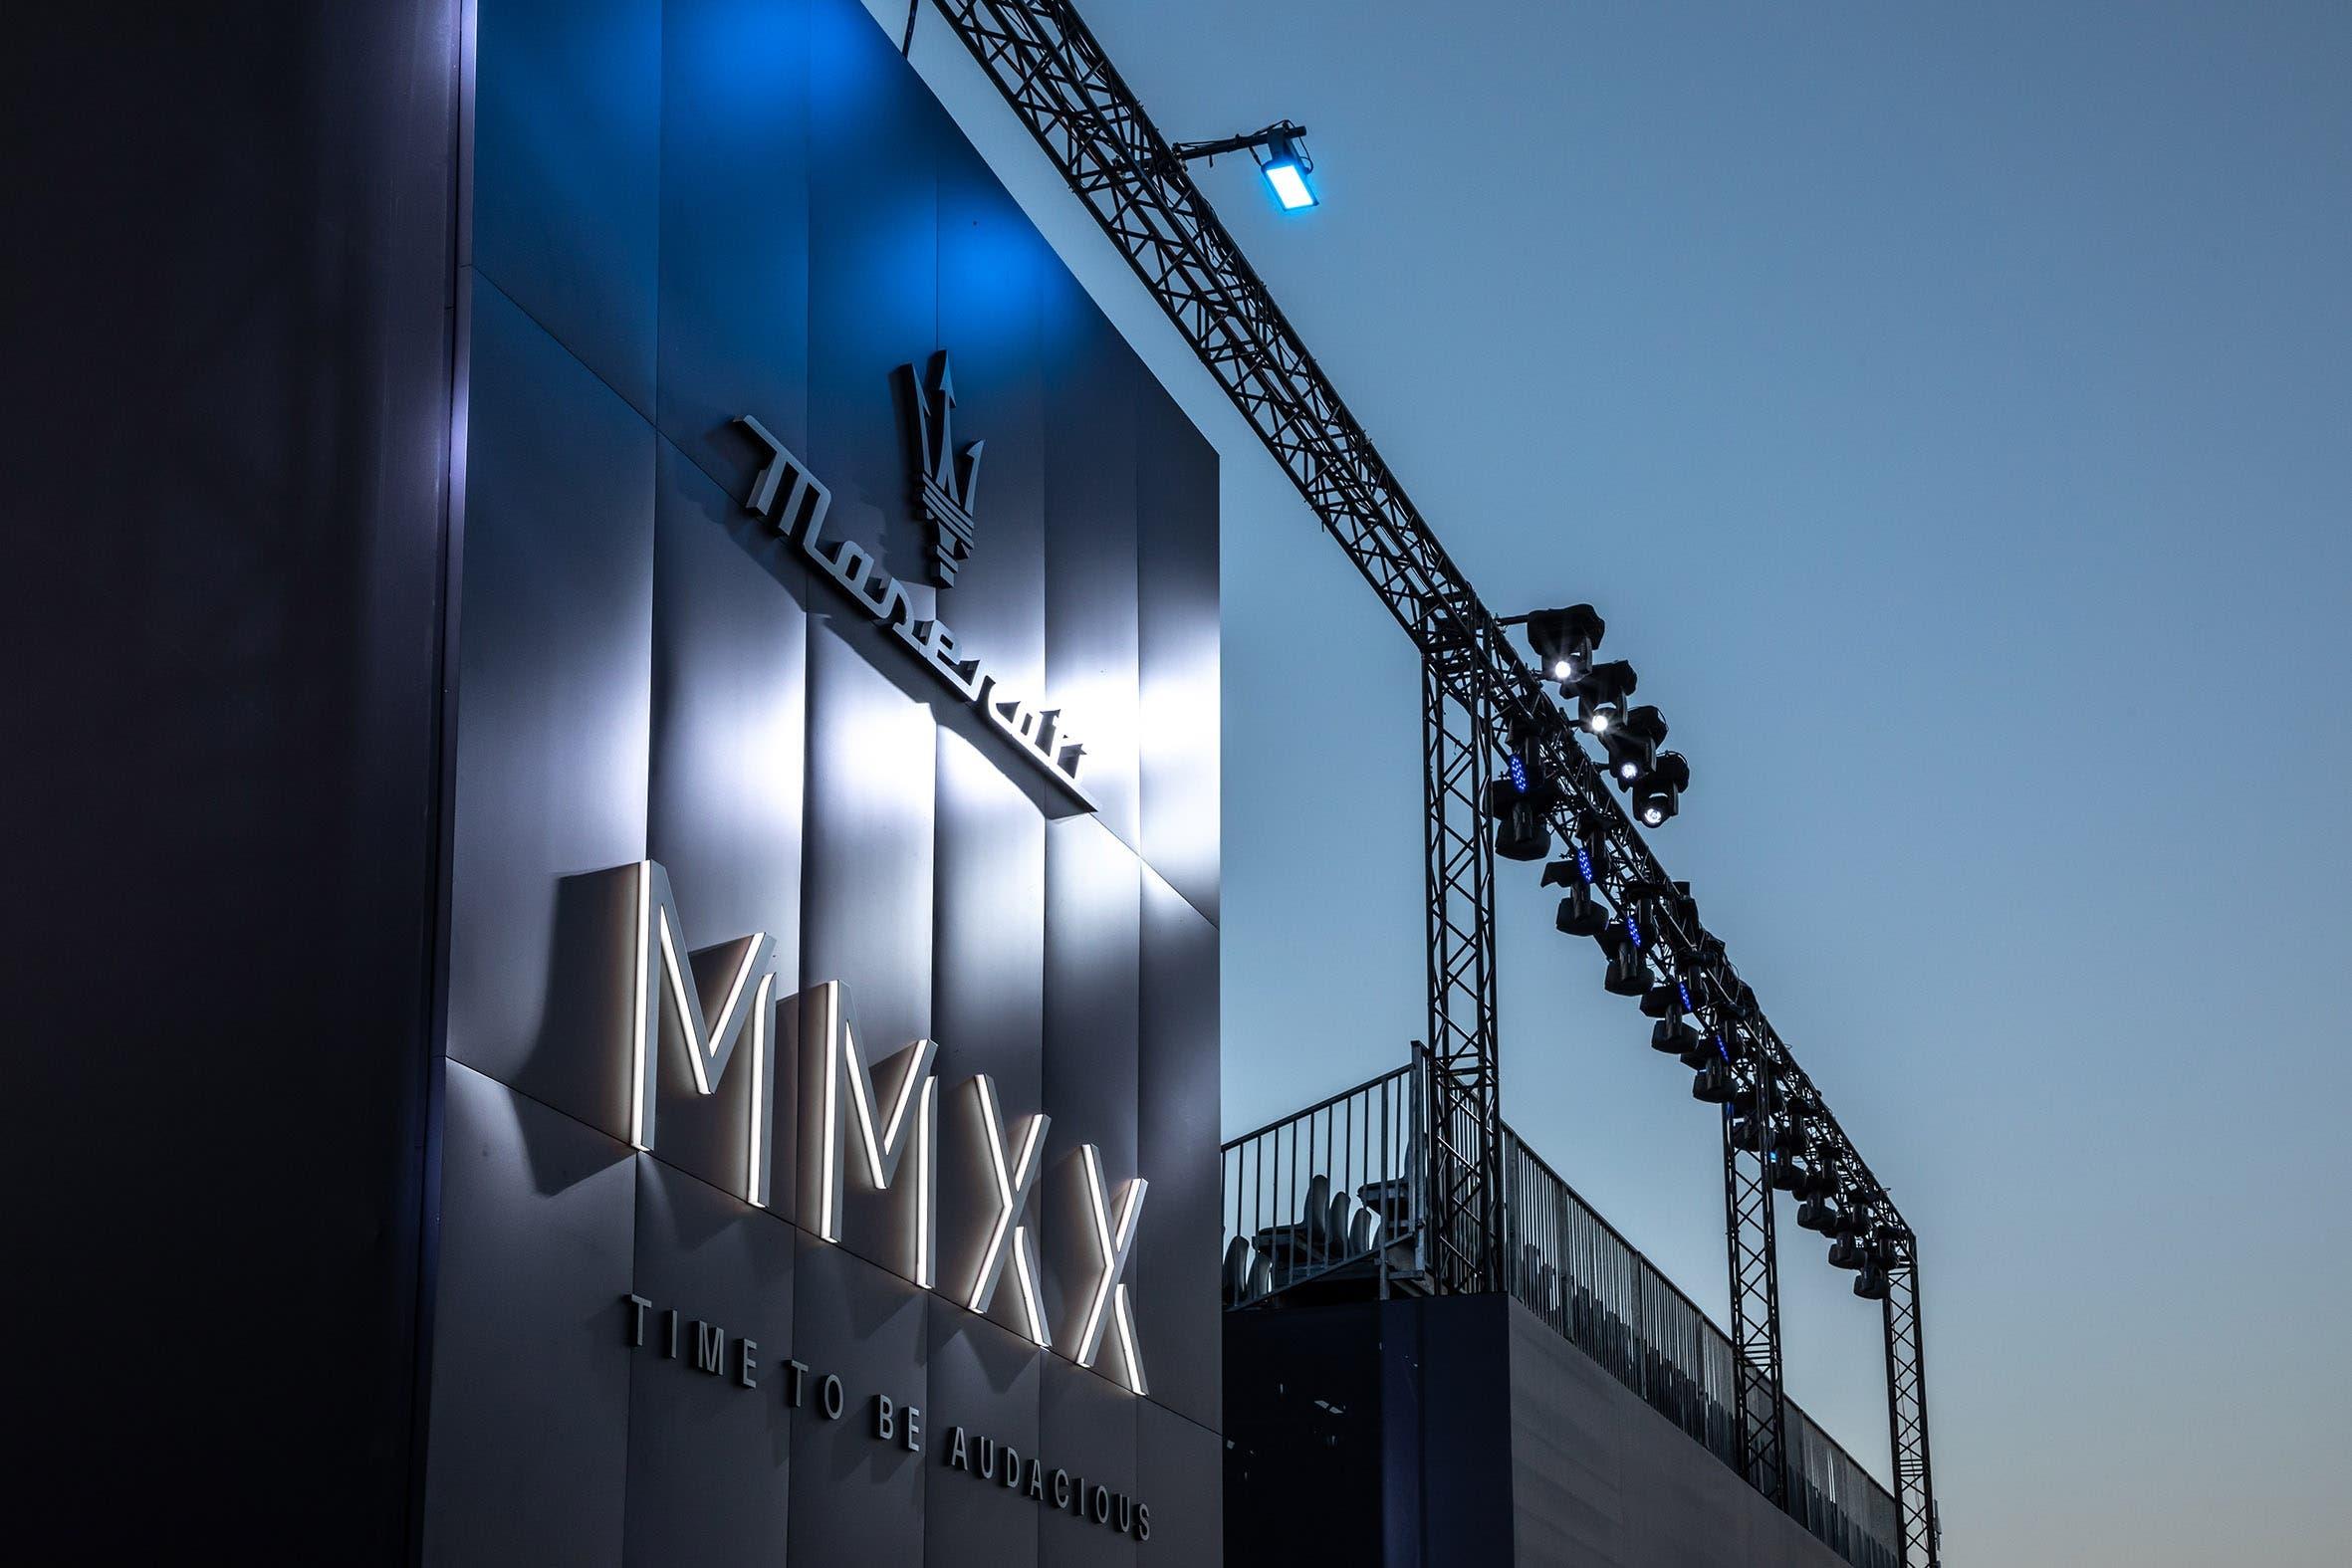 MMXX: Time to be Audacious Maserati